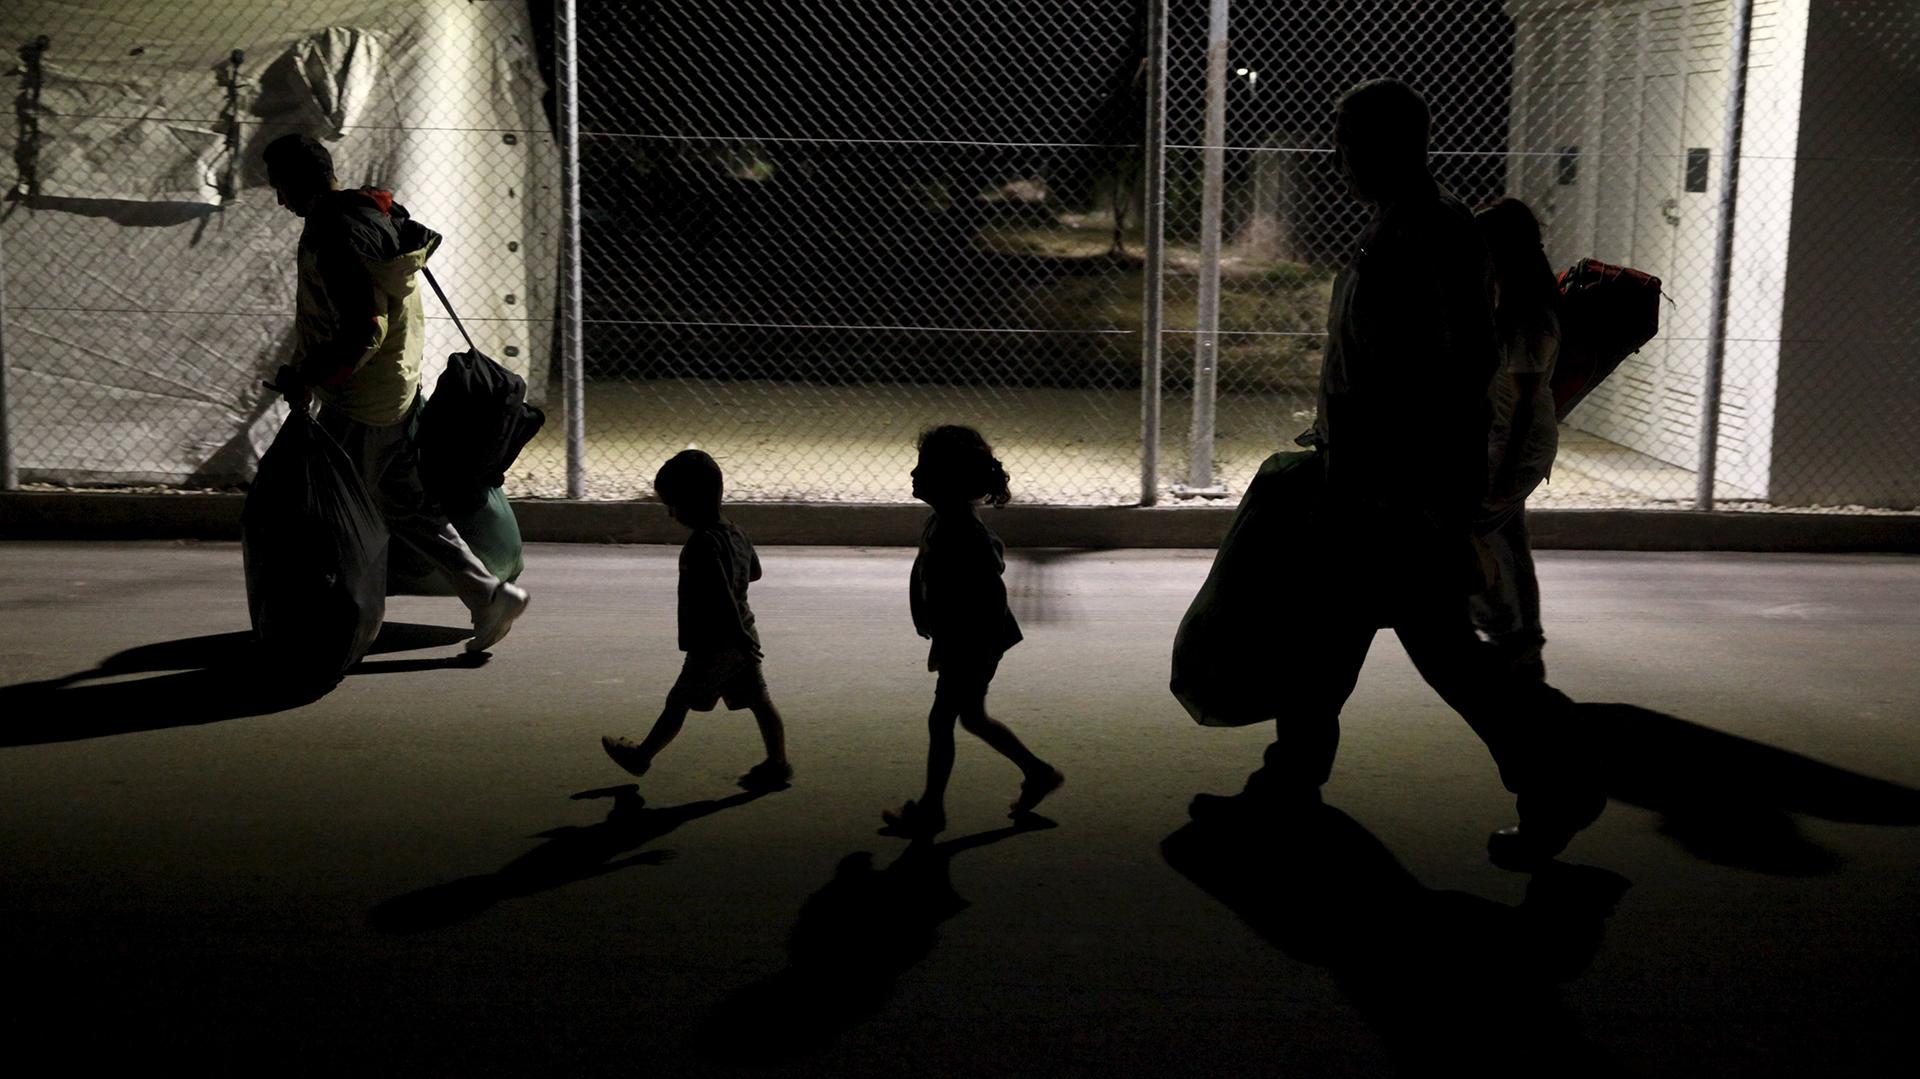 Migrantes ingresan en un centyro de procesamiento en Kokkinotrimithia, Chipre (REUTERS/Yiannis Kourtoglou)